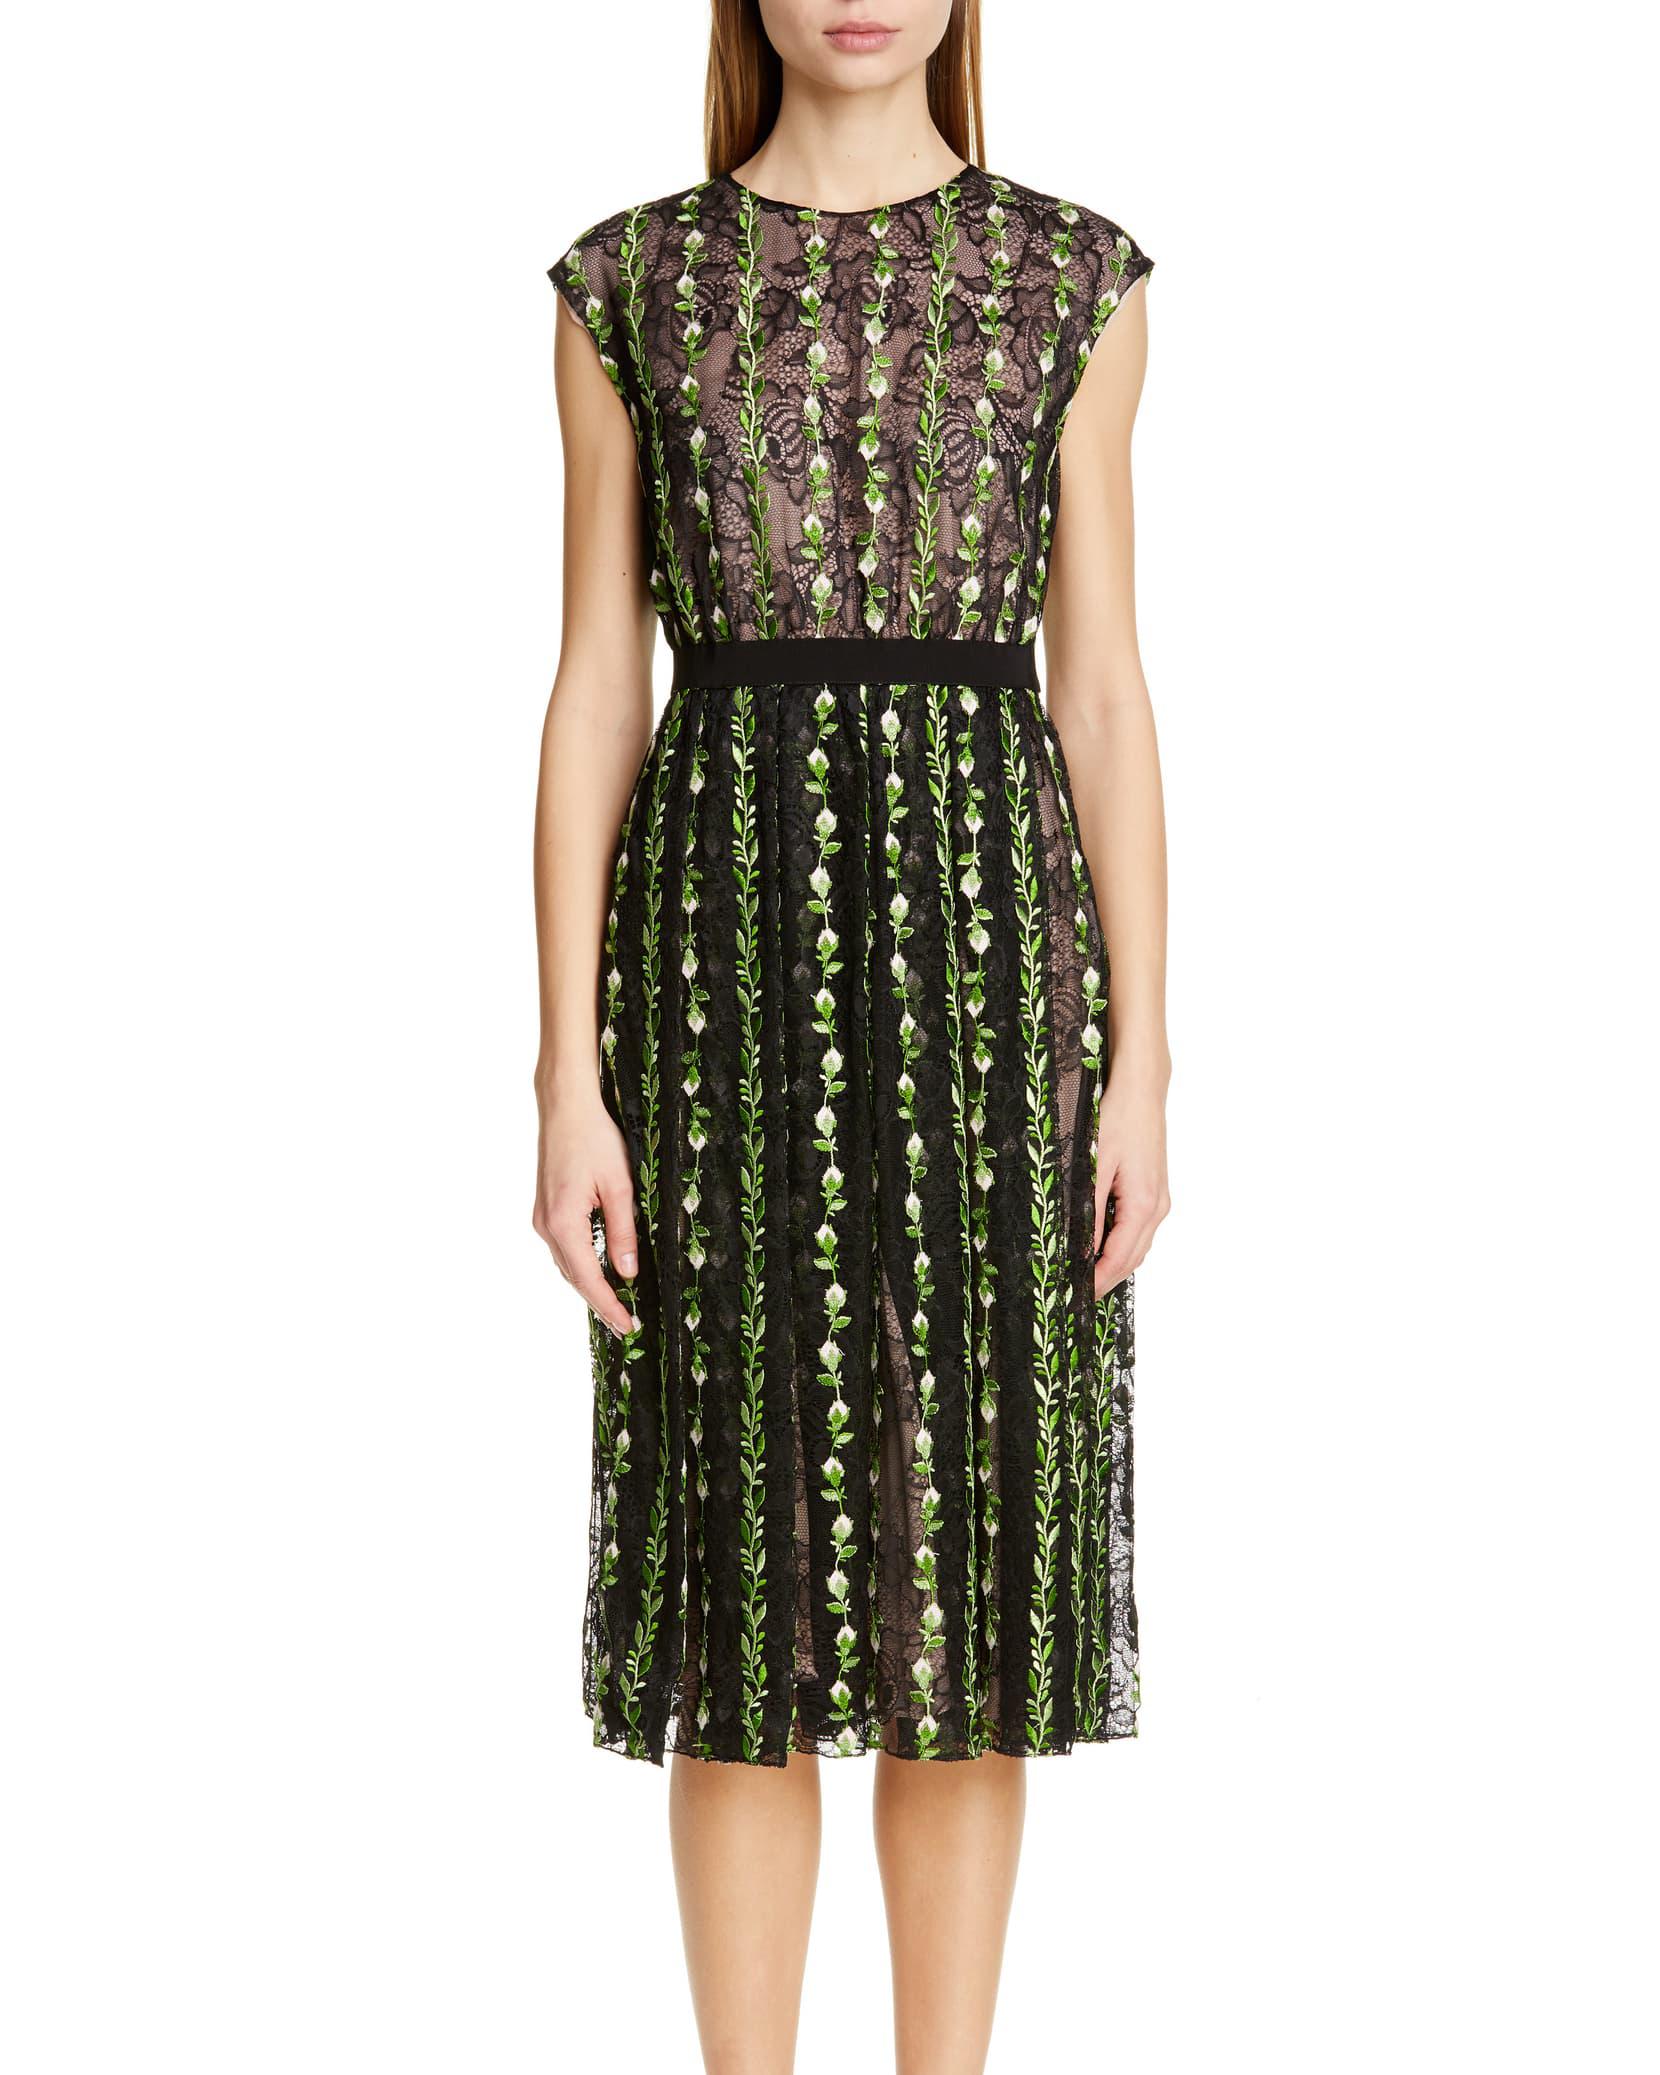 Giambattista Valli Floral Lace Cocktail Dress